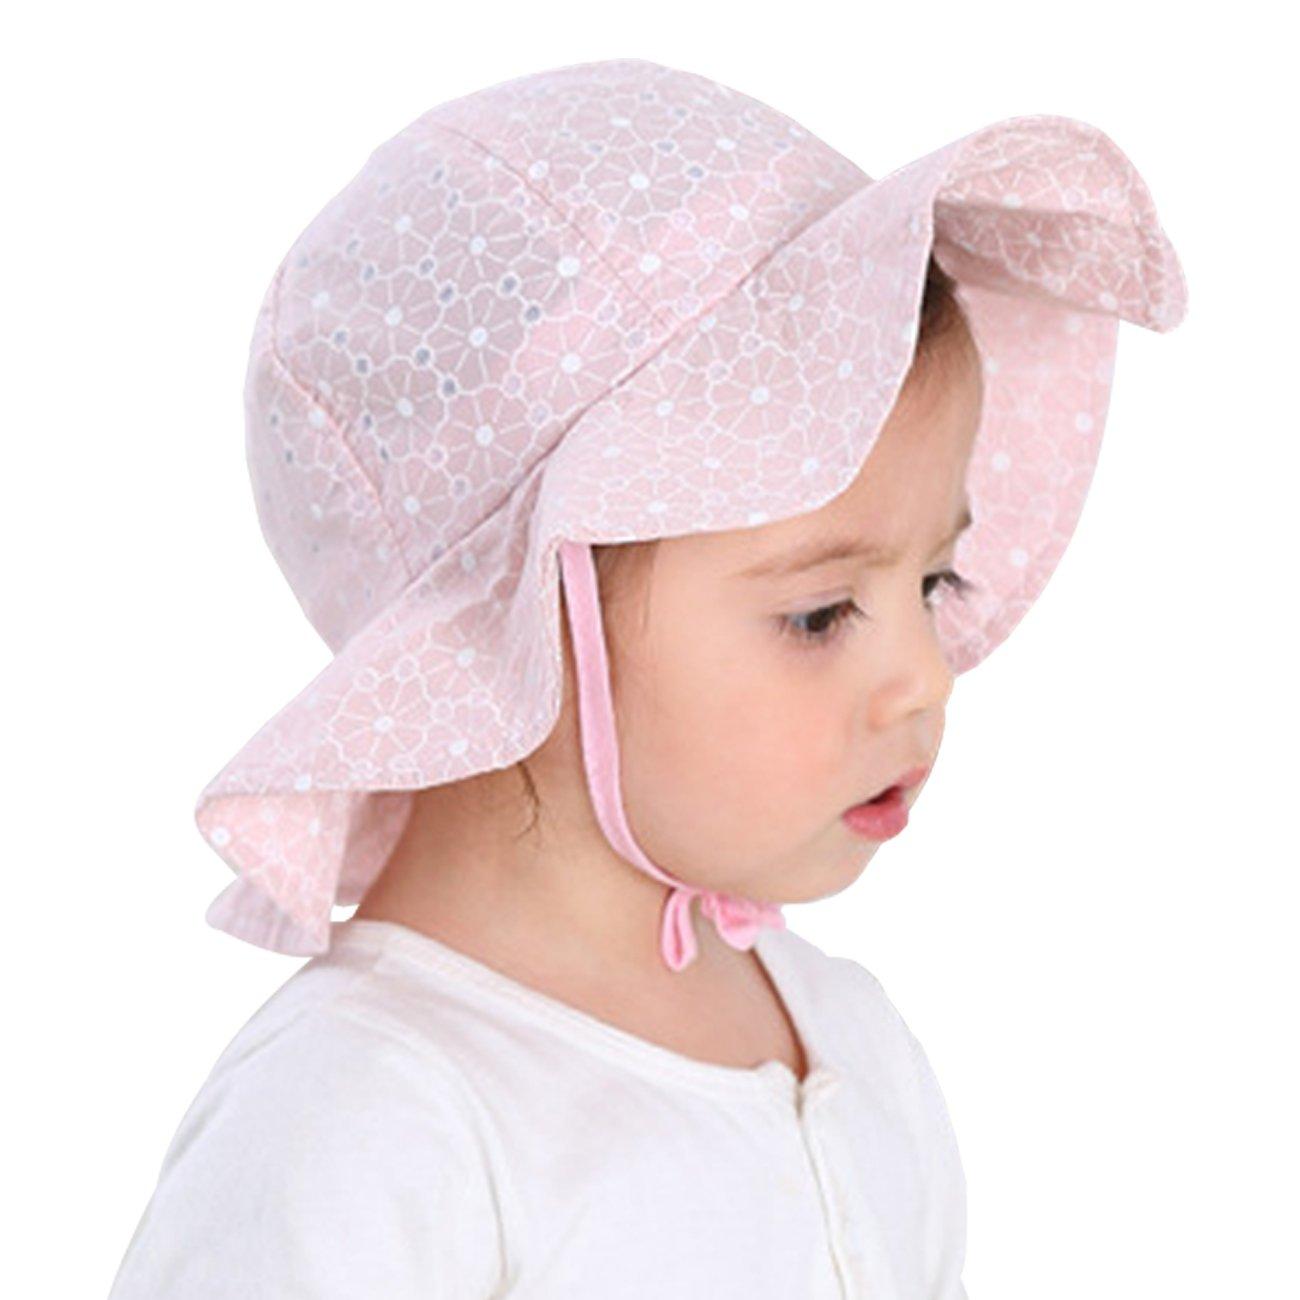 DRESHOW HAT ベビーガールズ 6 Month - 3 Year Lace Pink B07BF9B49N